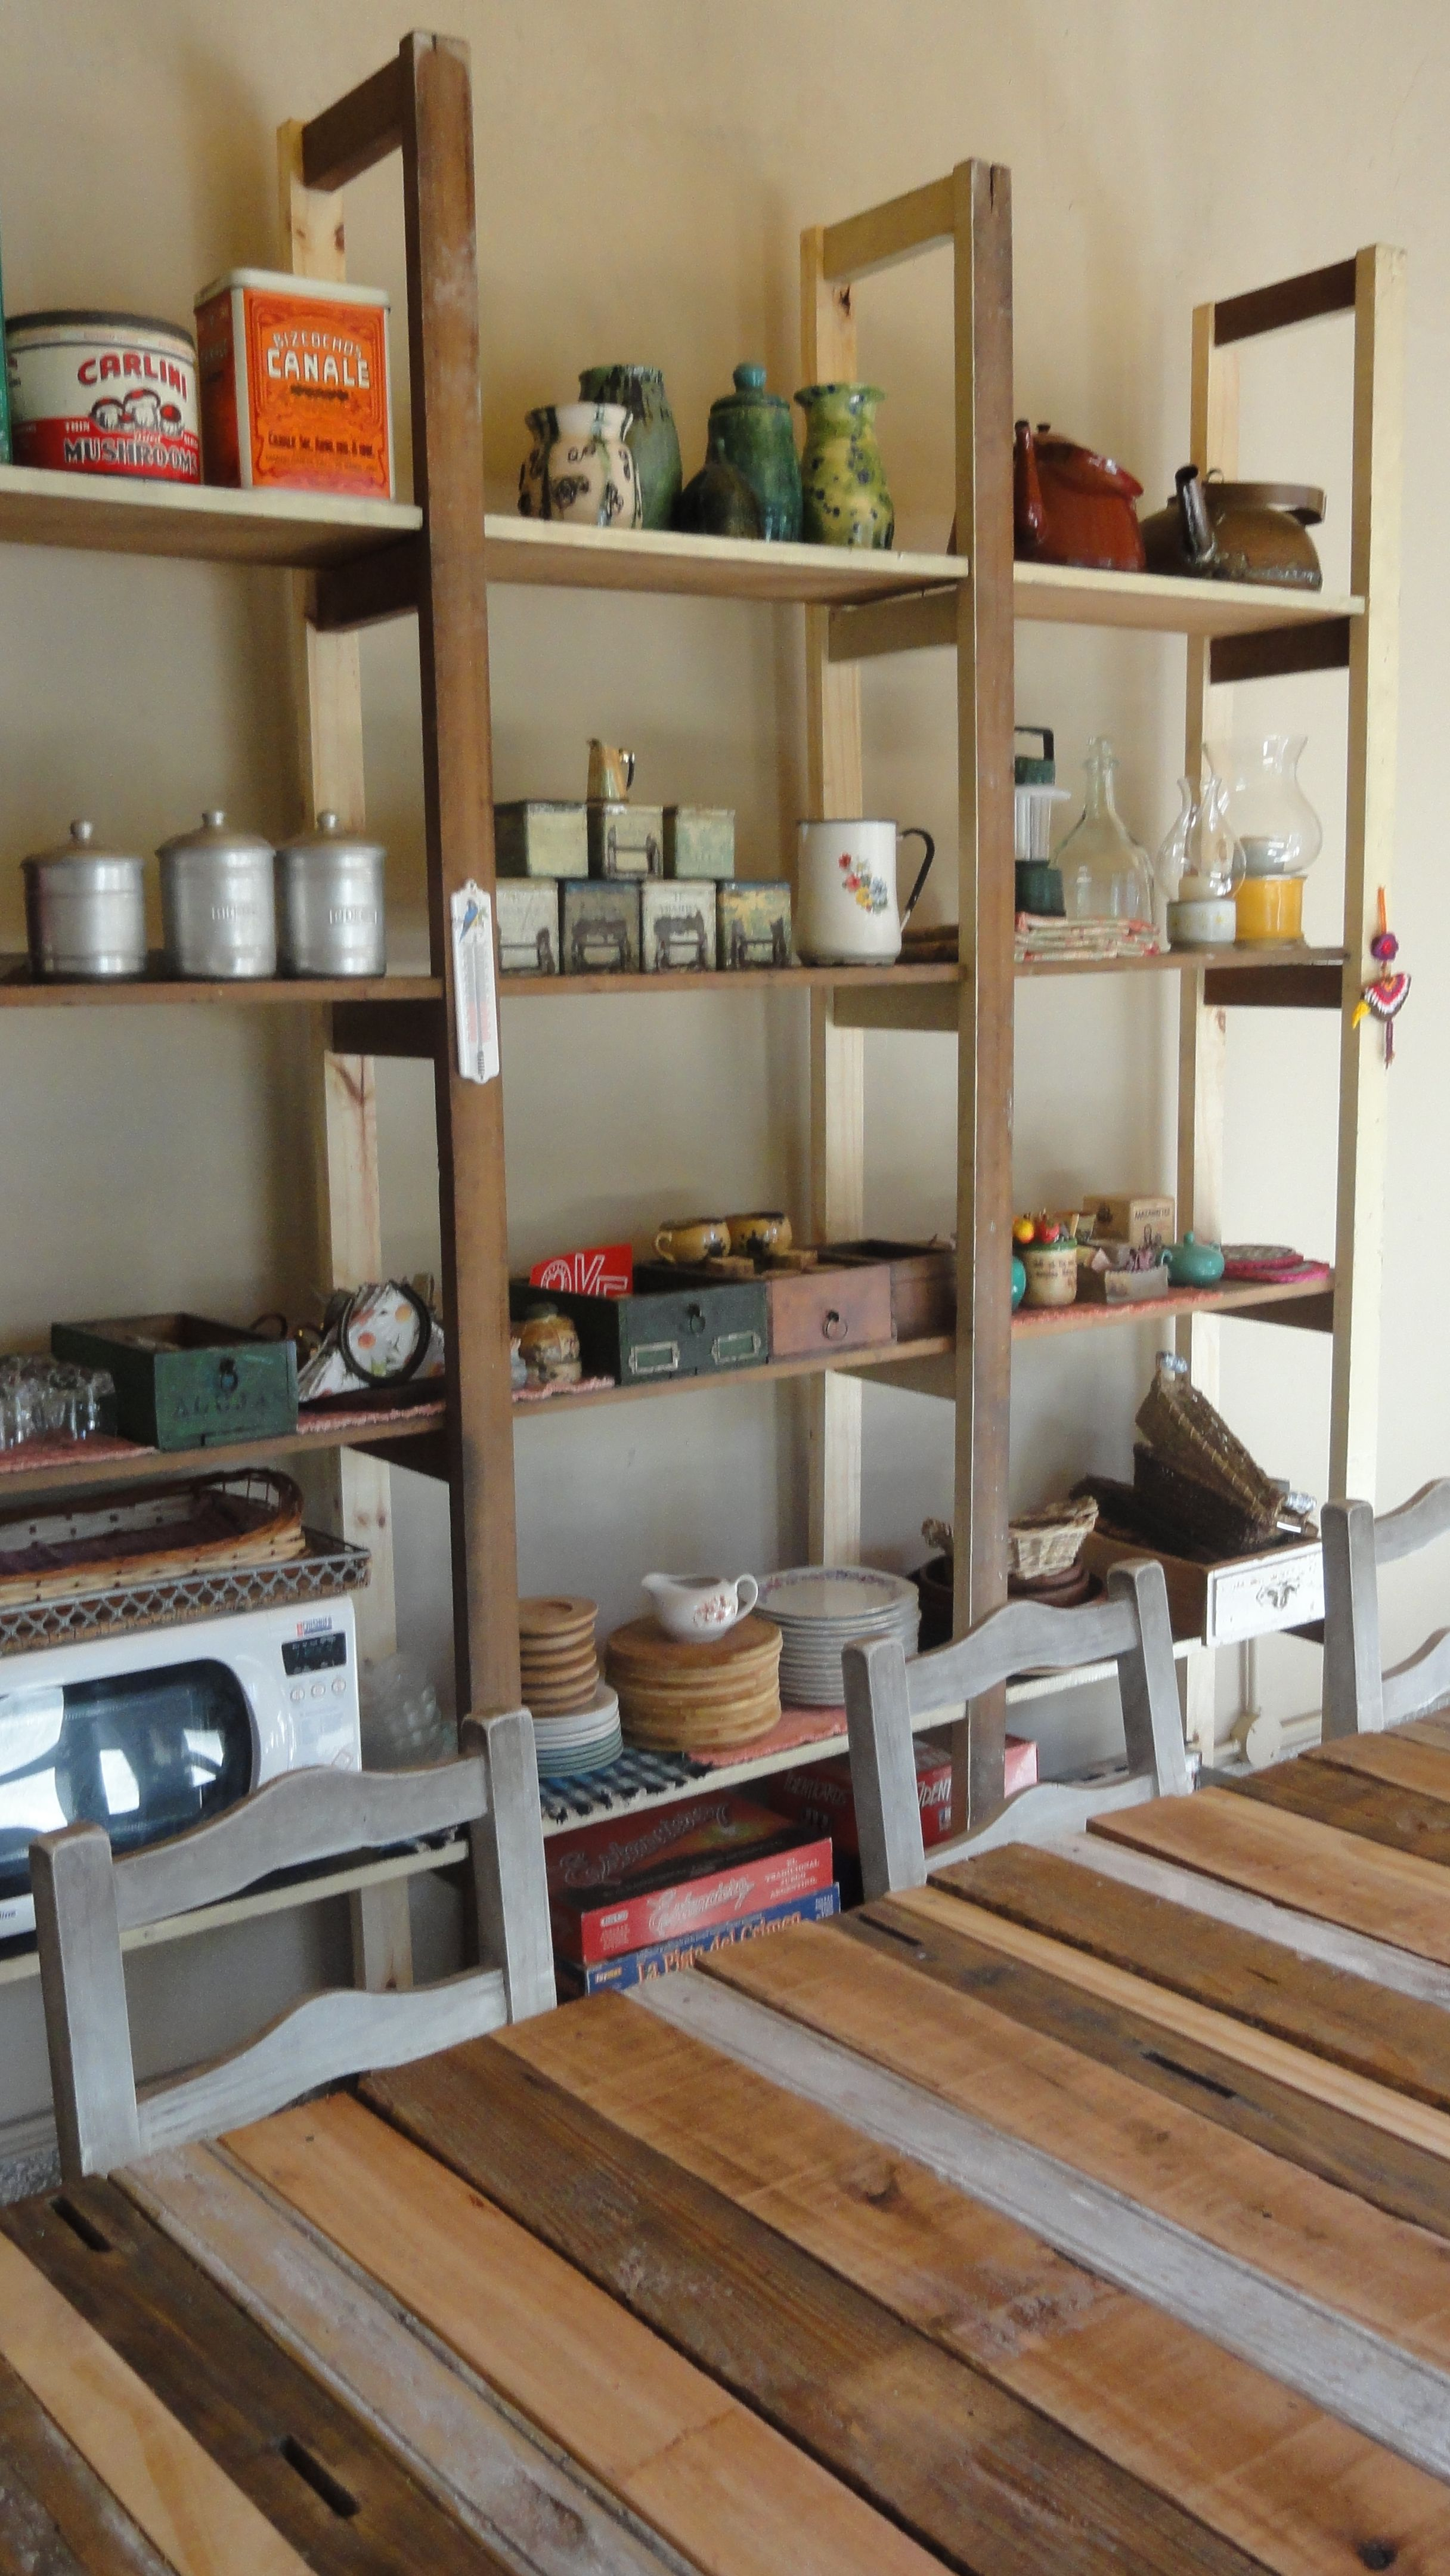 Estanteria de madera antes usada para herramientas y hoy - Estanterias para cocina ...